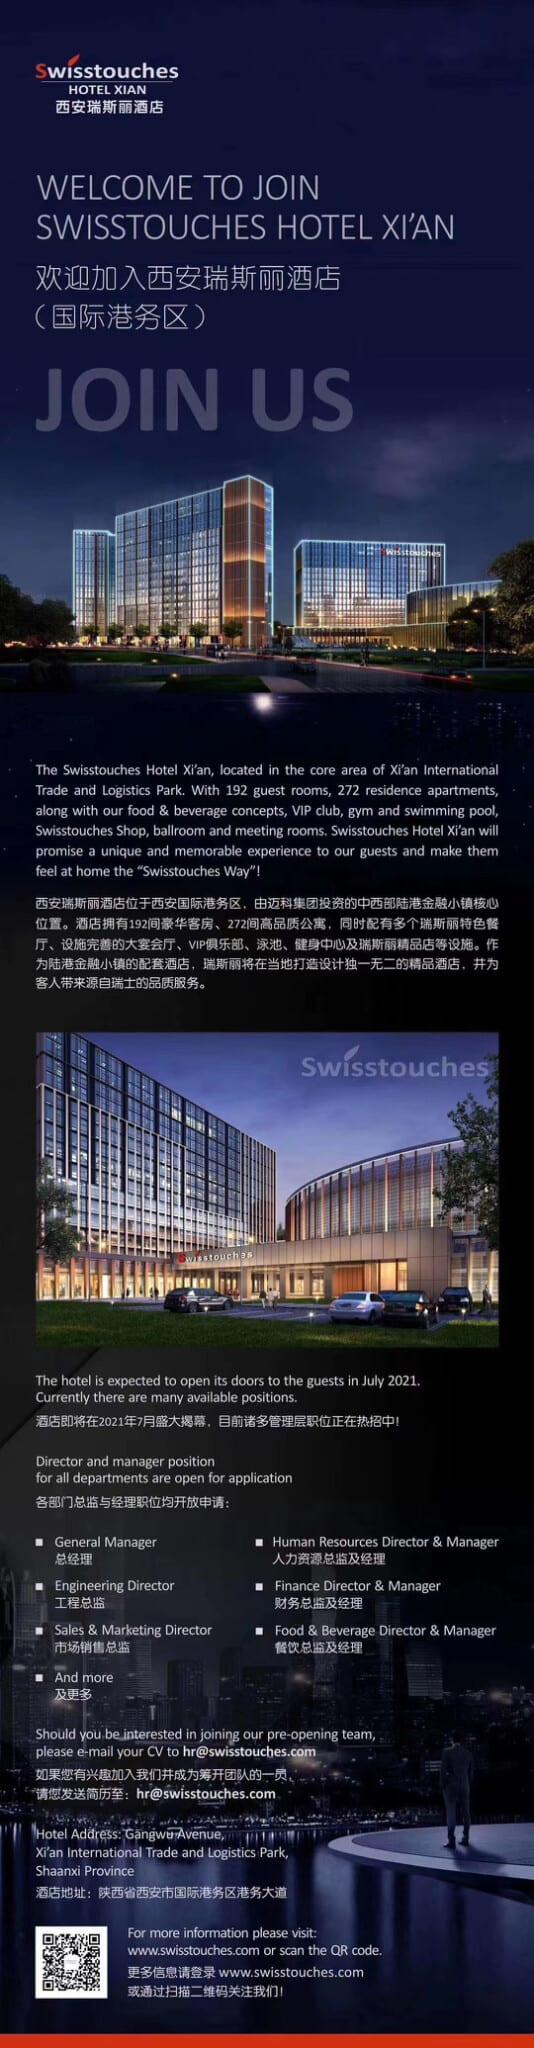 Swisstouches Hotel Xian